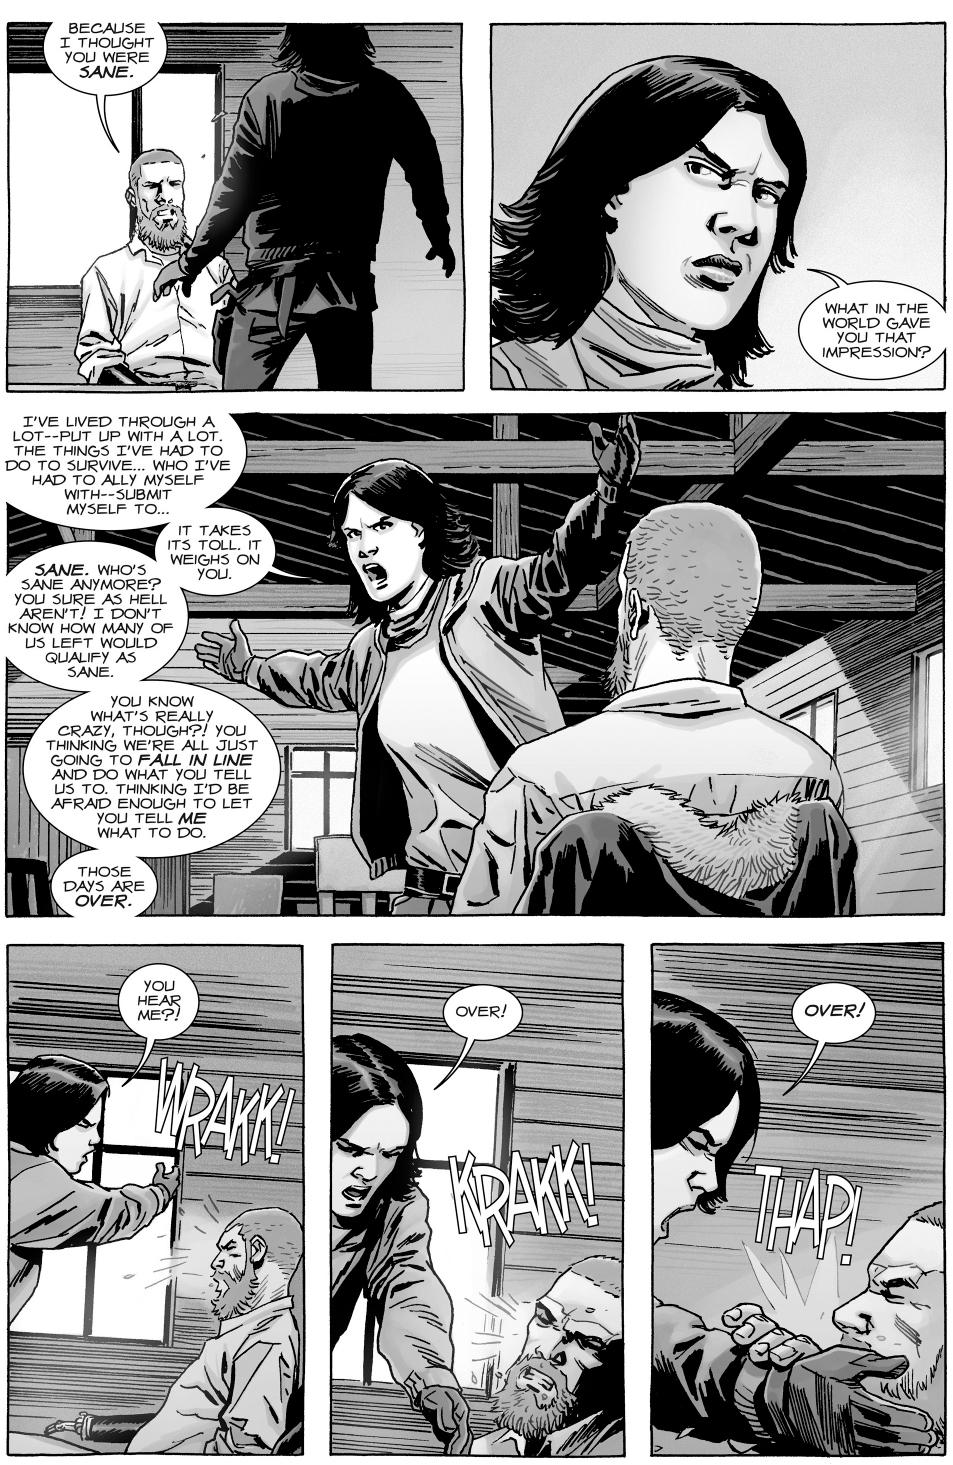 Rick Grimes Kills Sherry (The Walking Dead)